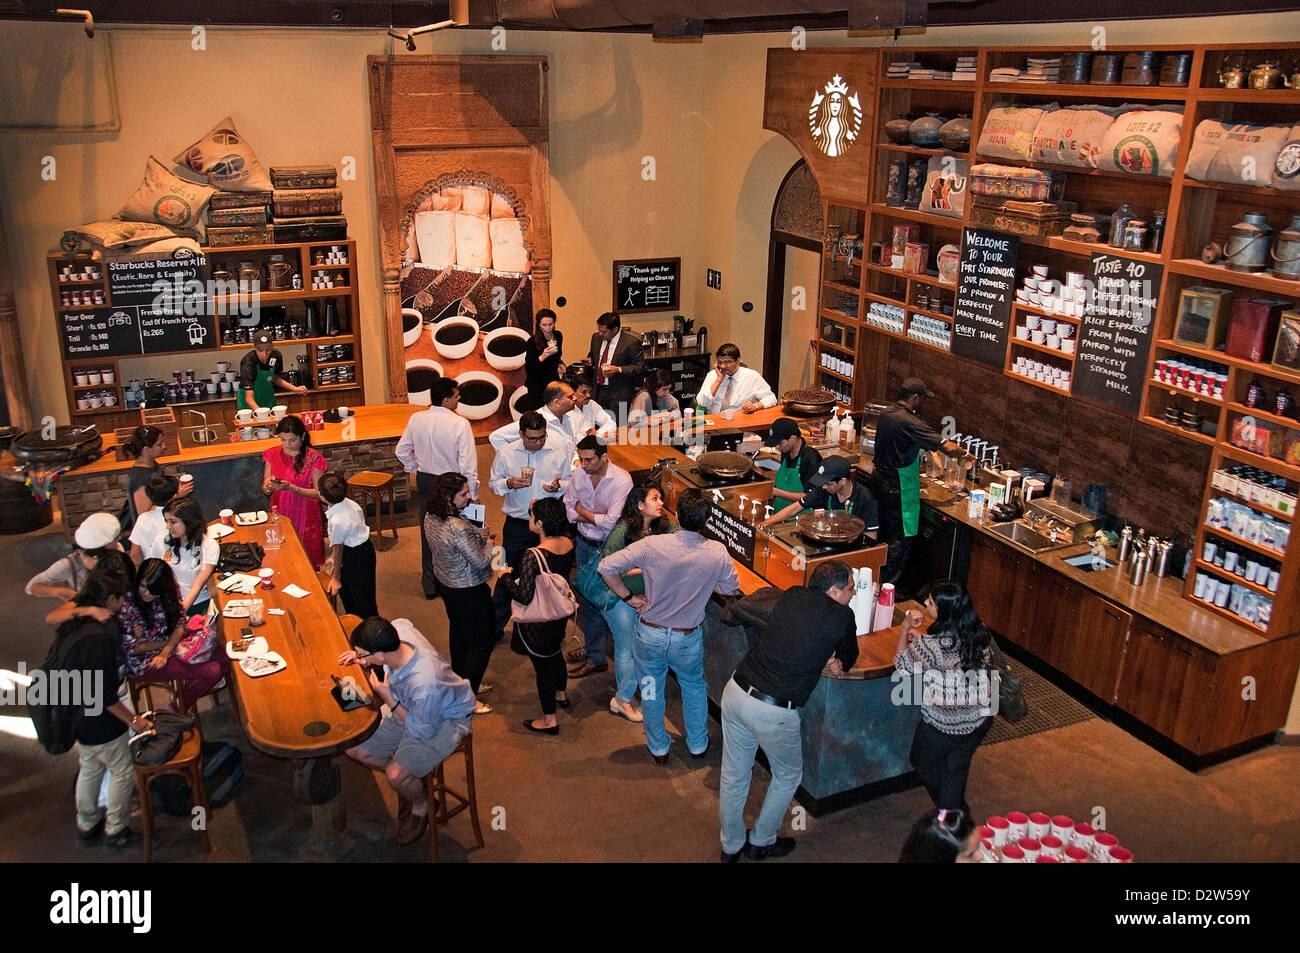 Starbucks Coffee trendige coole Mumbai (Bombay) Café Bar Indien Stockbild